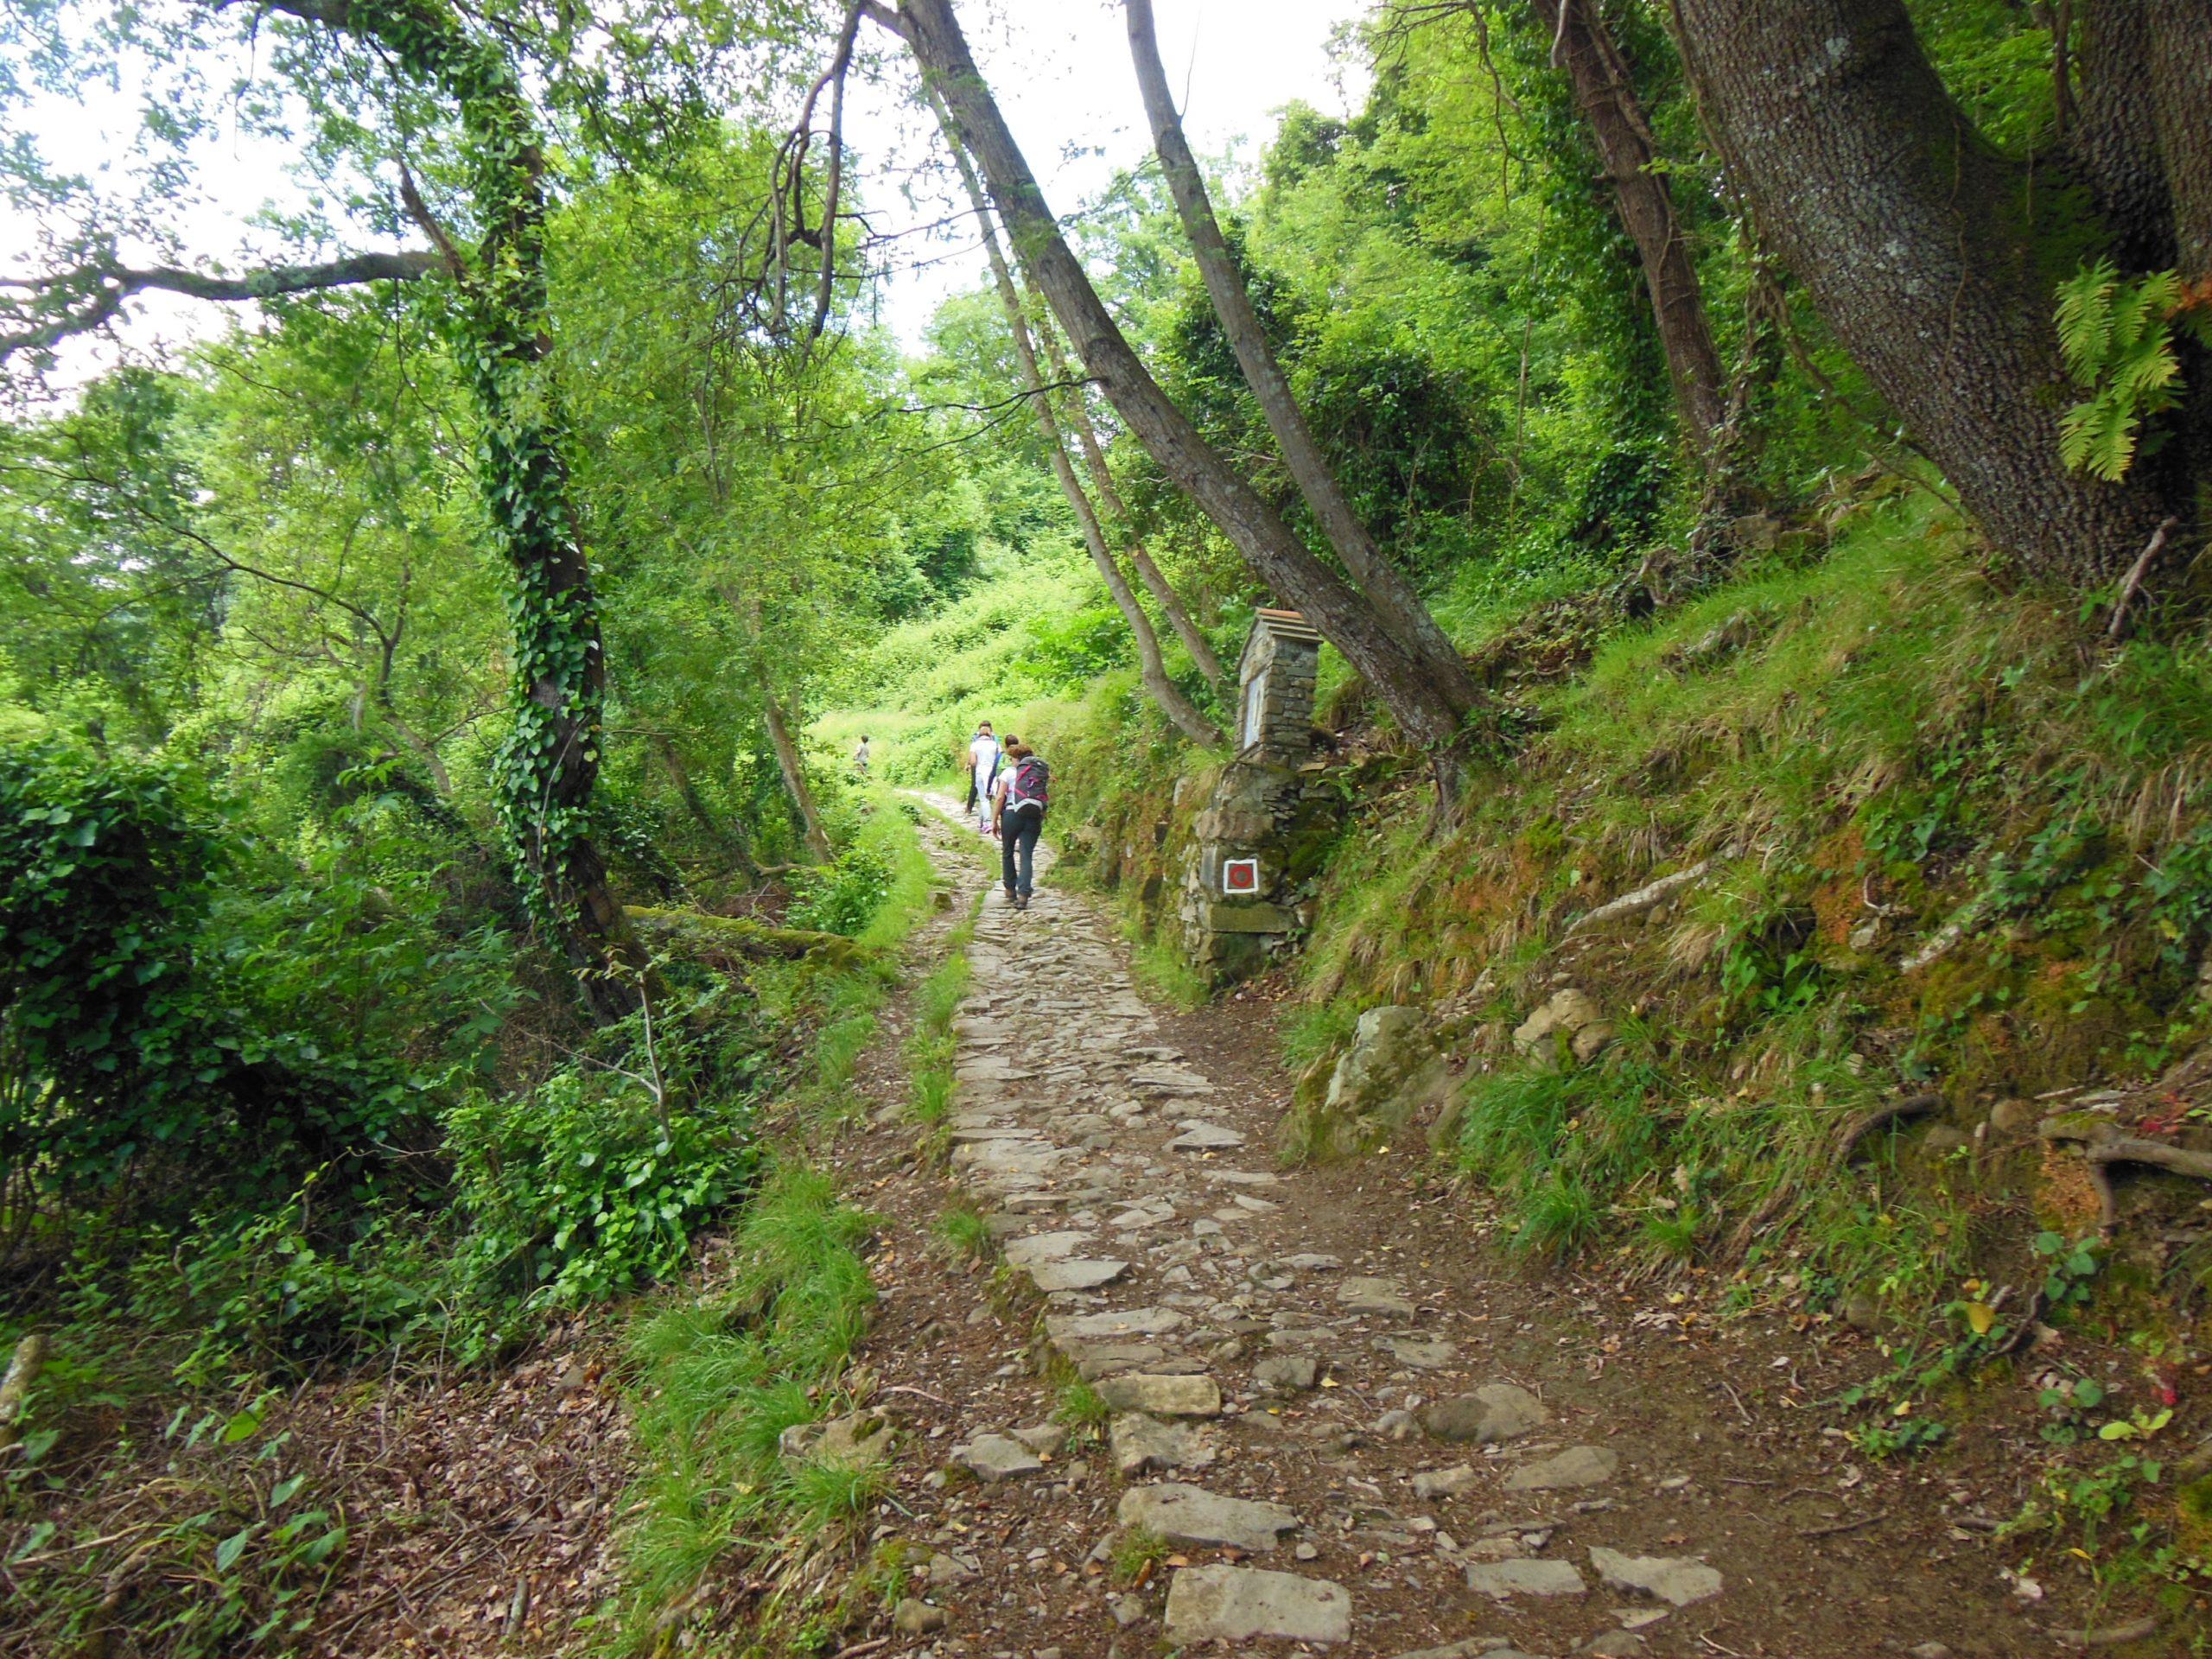 https://www.trekkilandia.it/wp-content/uploads/2020/06/escursione-Portofino-039-scaled.jpg